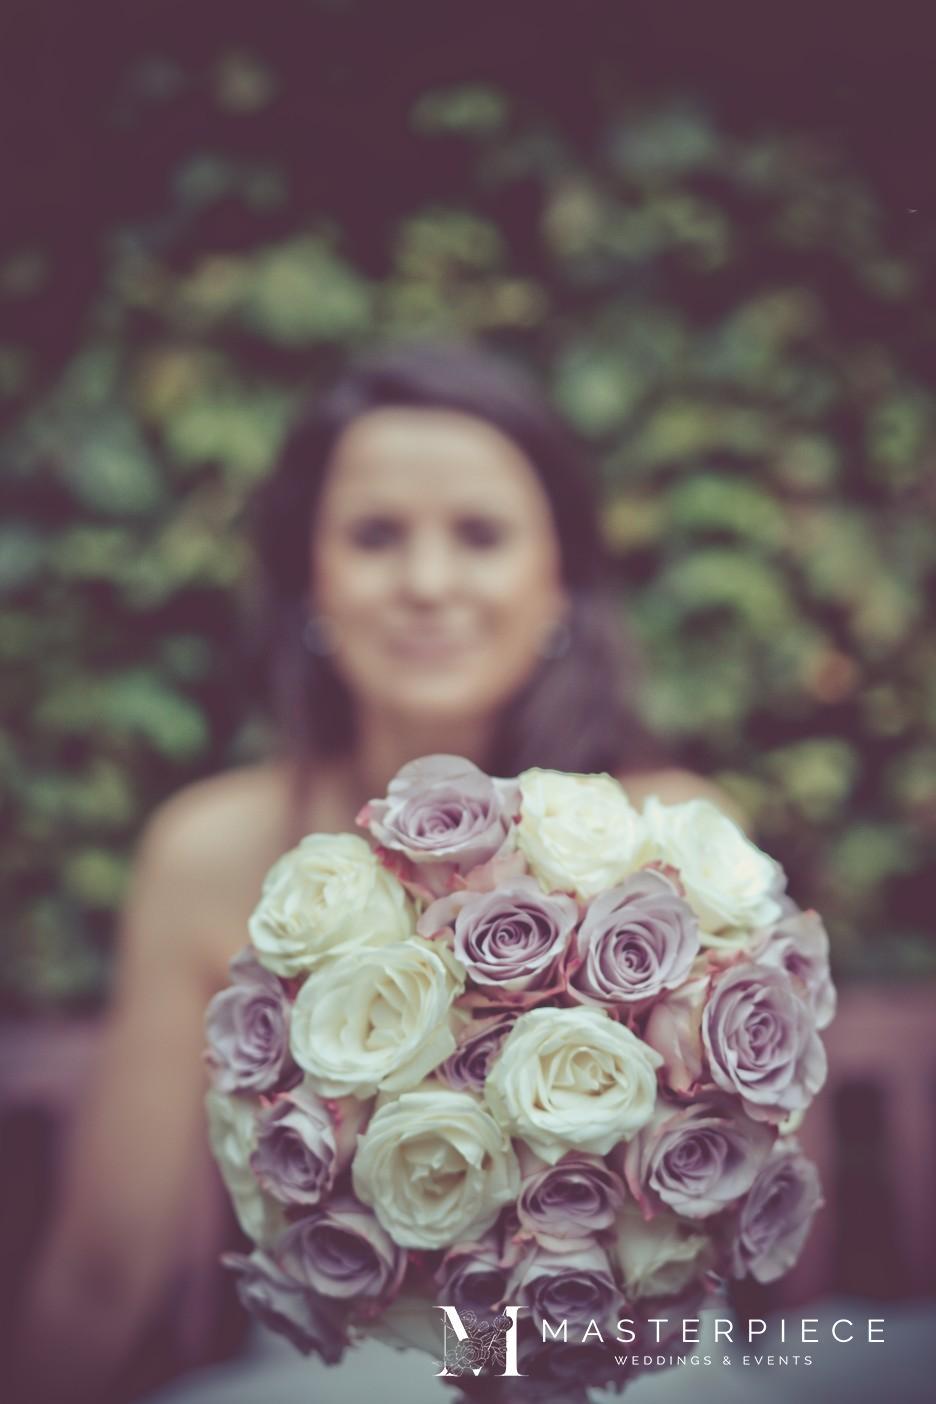 Masterpiece_Weddings_sluby_018